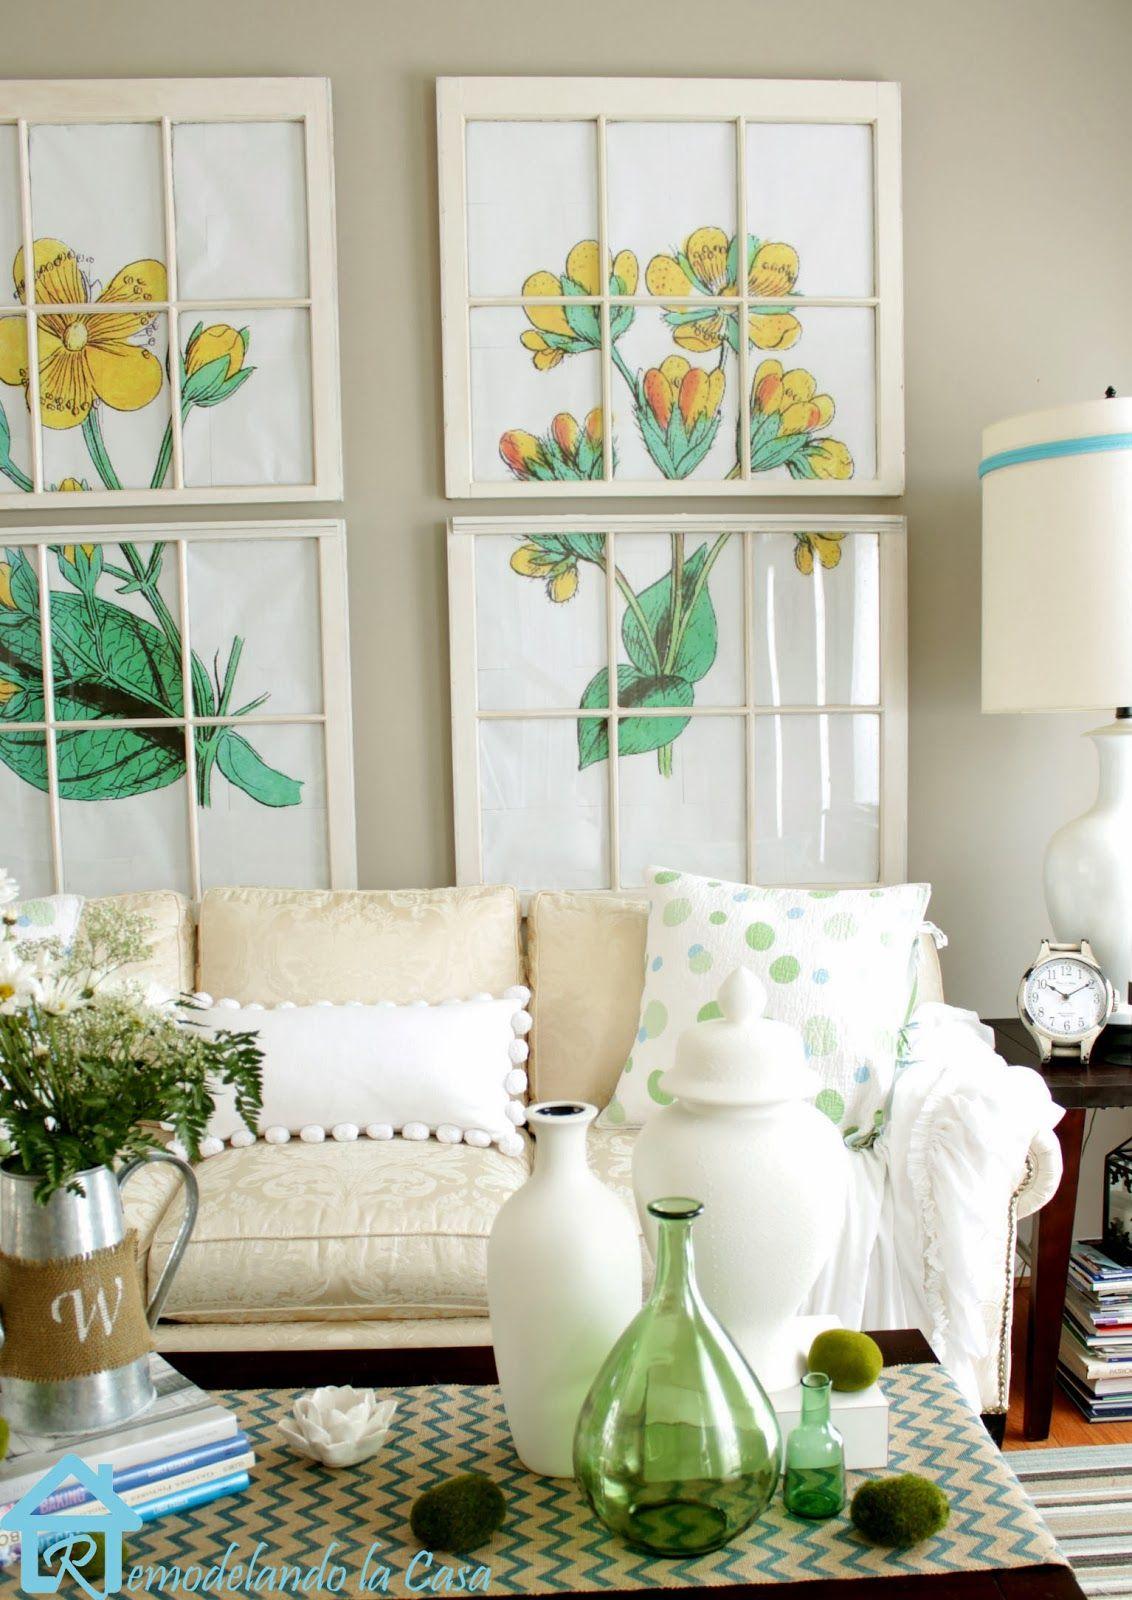 Home decor window  home decor ideas  decorating window and walls